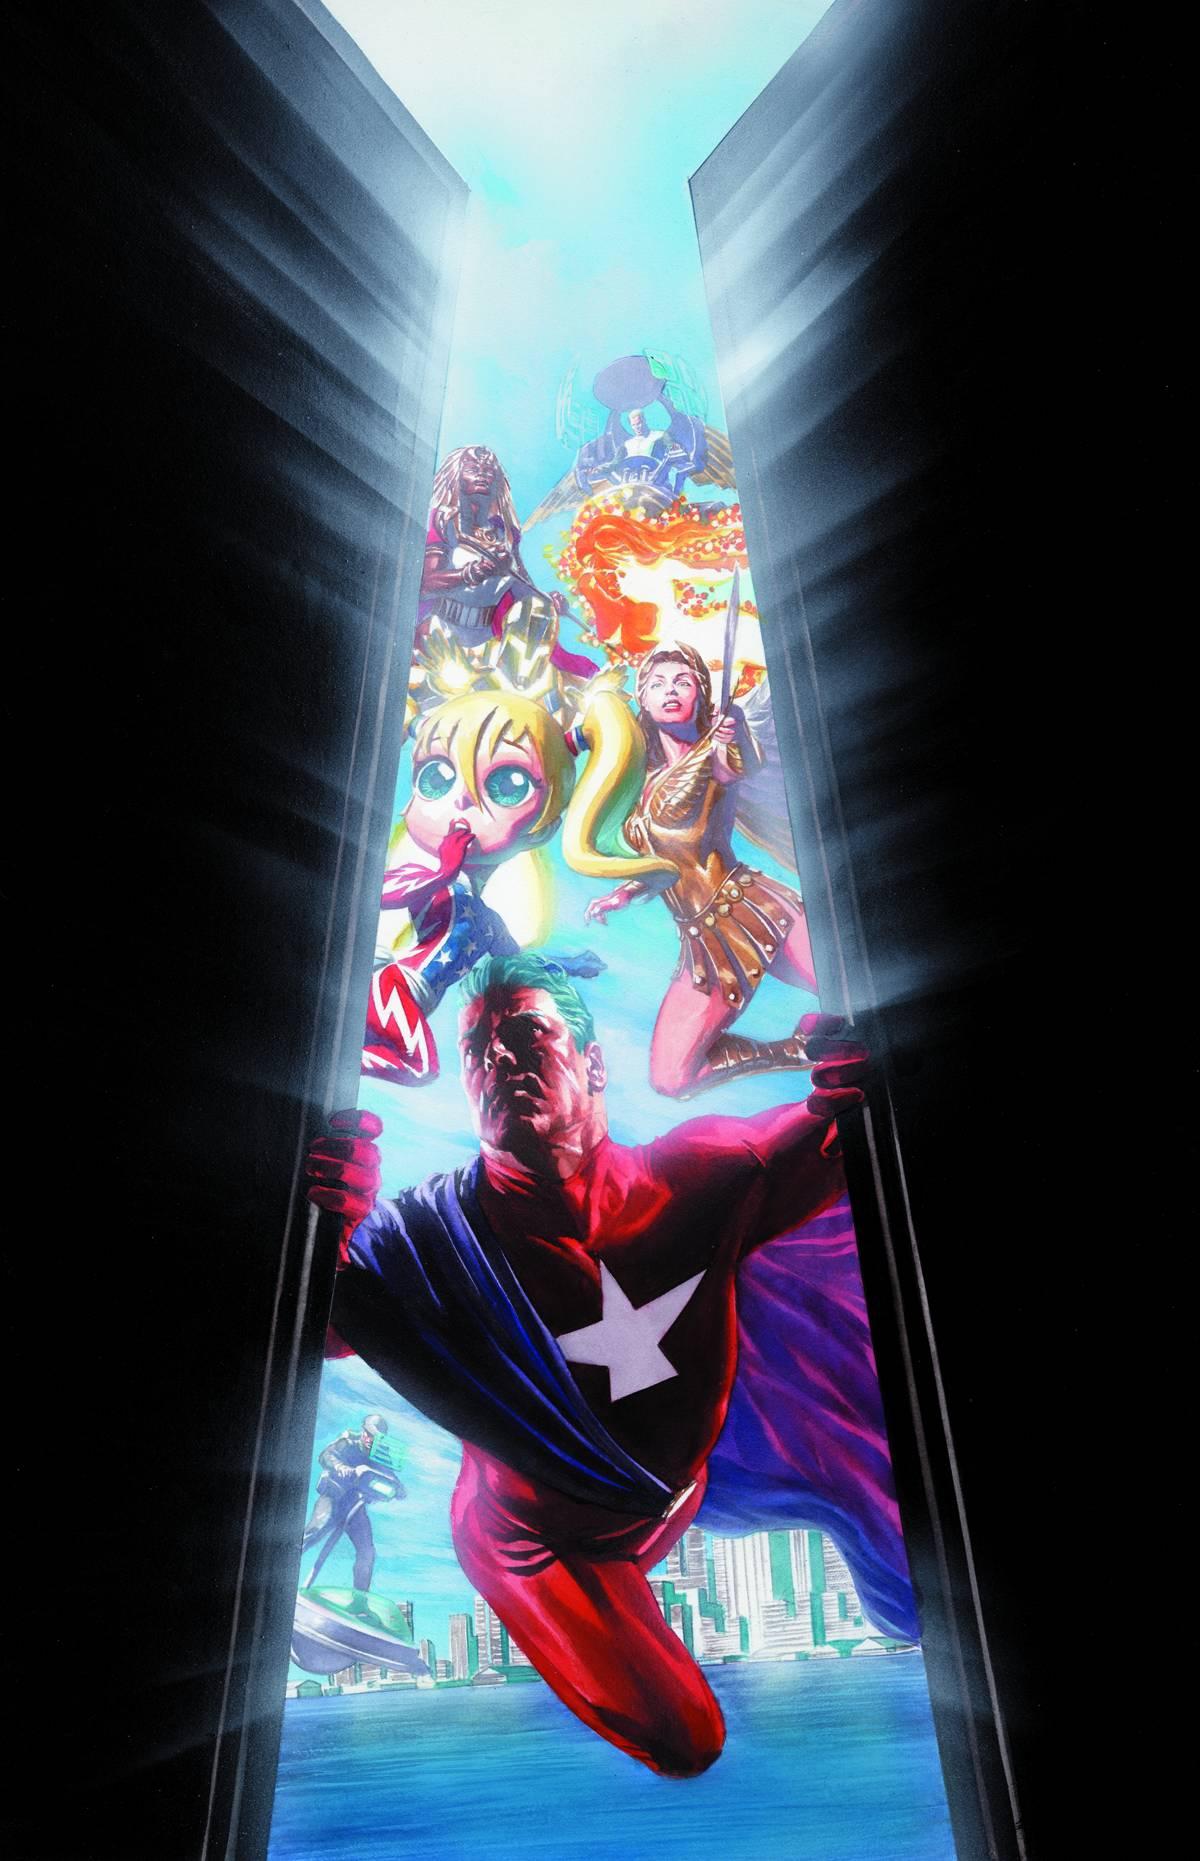 Astro City #1 Cvr A by Alex Ross